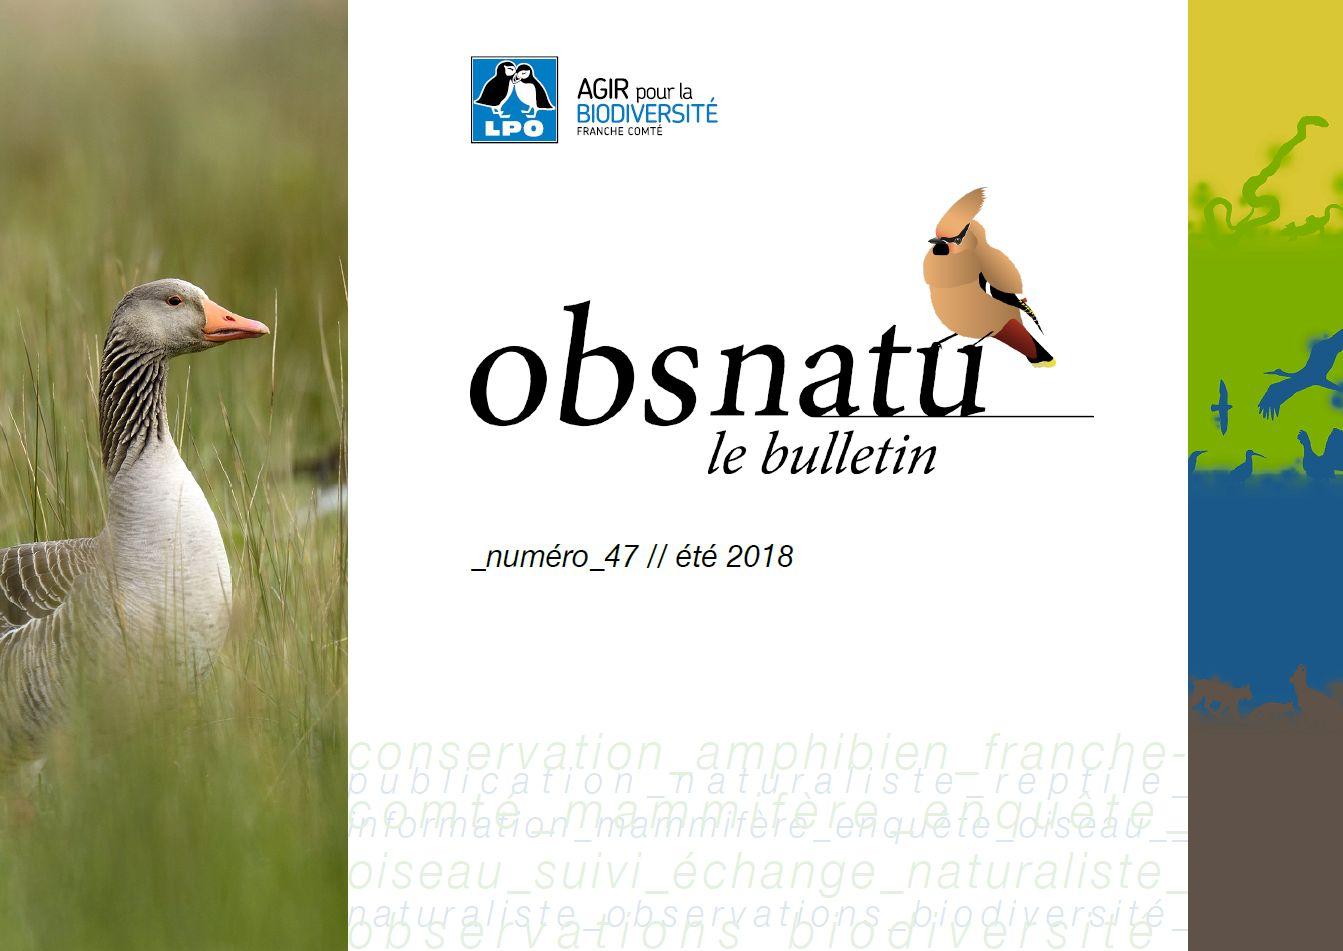 https://cdnfiles1.biolovision.net/franche-comte.lpo.fr/userfiles/publications/Obsnatubulls/Obsnatun47ete2018couv.jpg